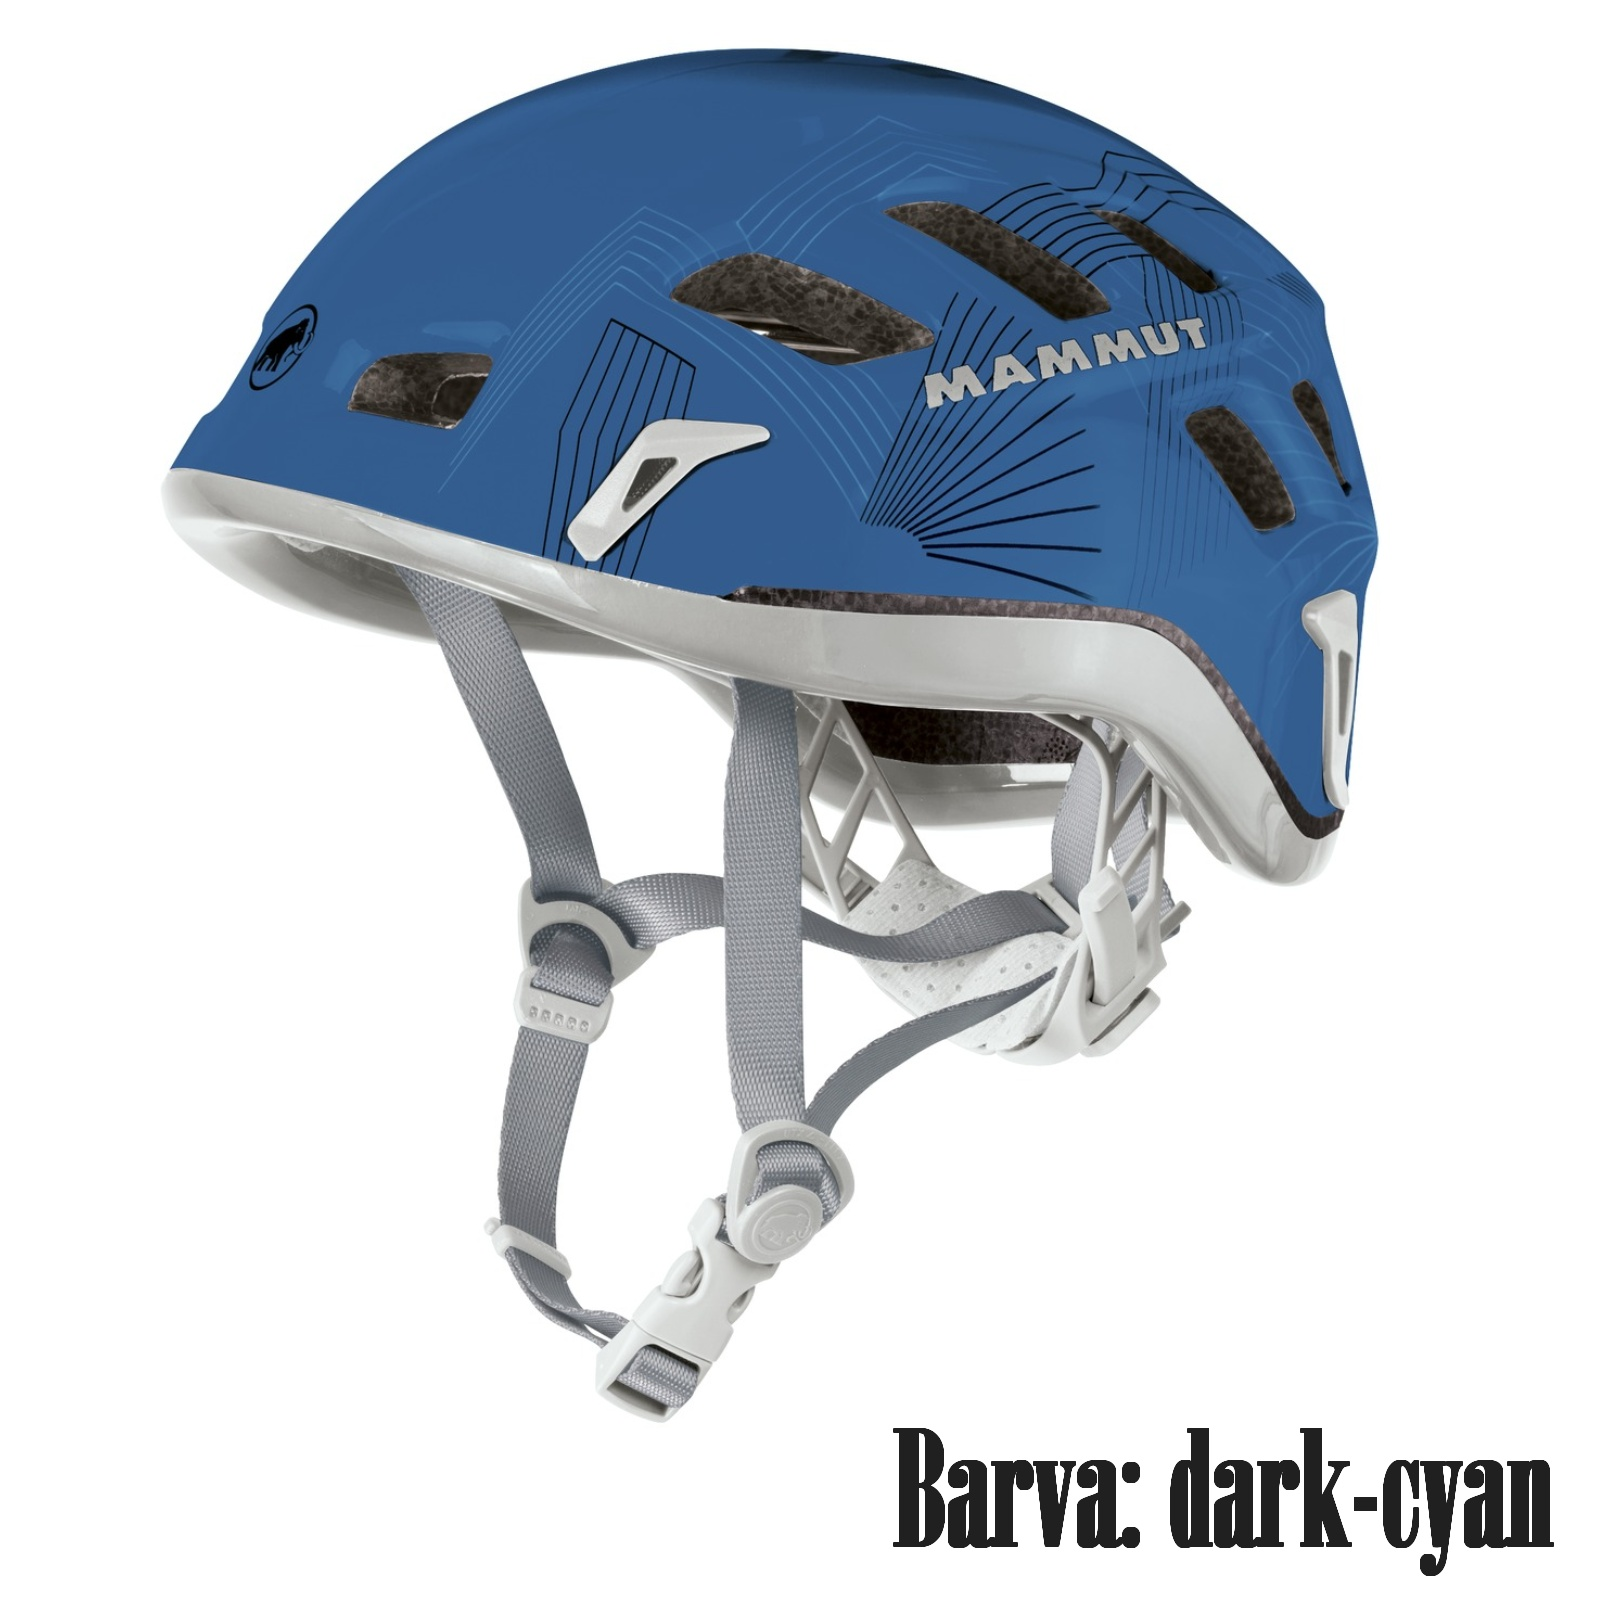 Horolezecká přilba MAMMUT Rock Rider dark cyan - vel. 56-61 cm